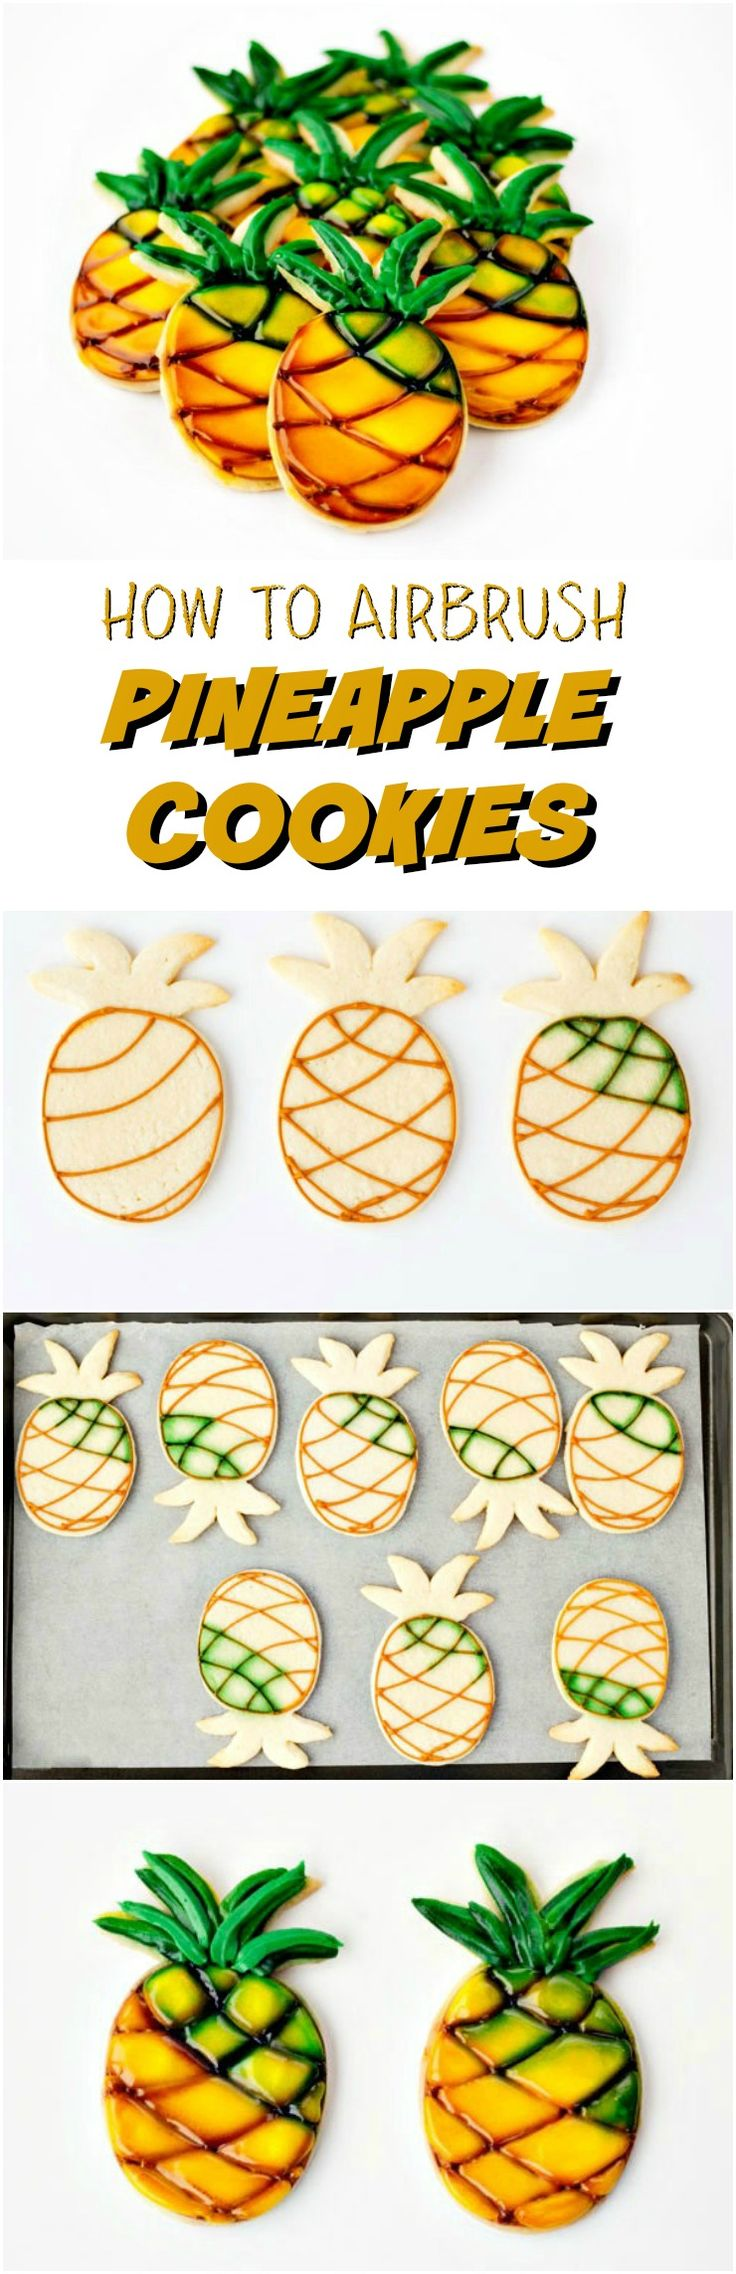 How to Make and Airbrush Pineapple Cookies via www.thebearfootbaker.com